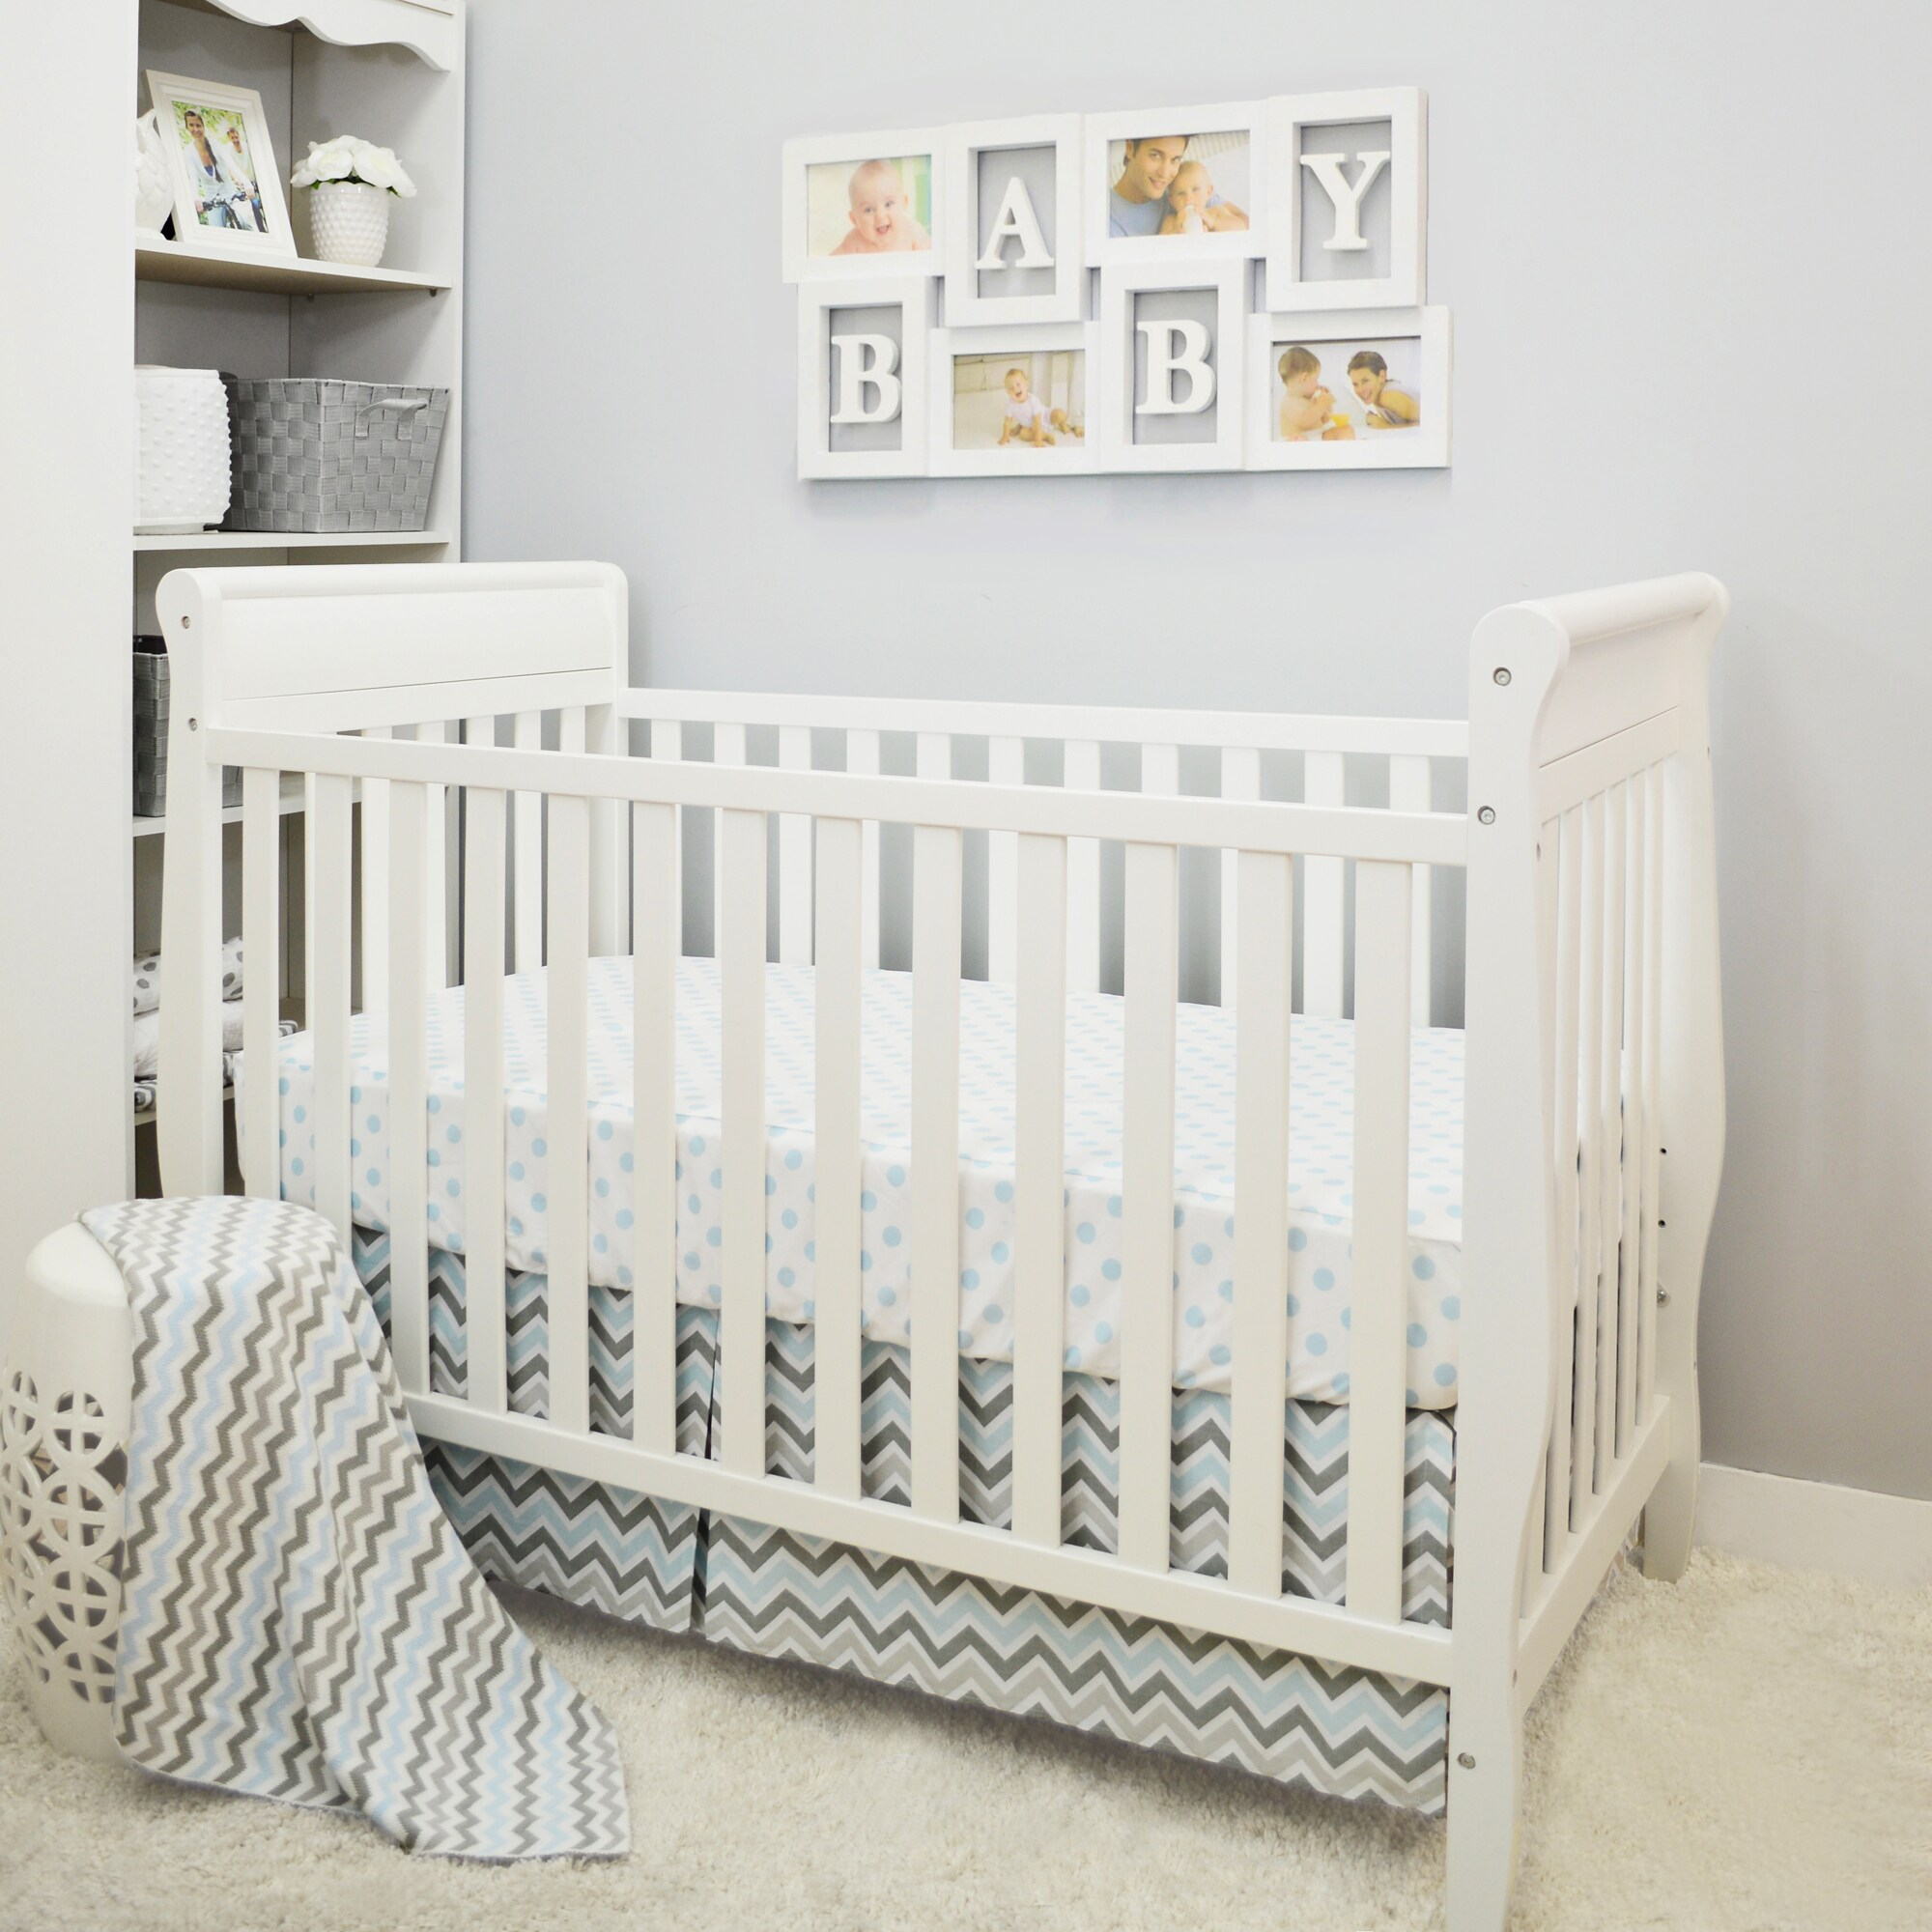 AMERICAN BABY COMPANY (ABC) Baby Chevron Crib Bedding Set...